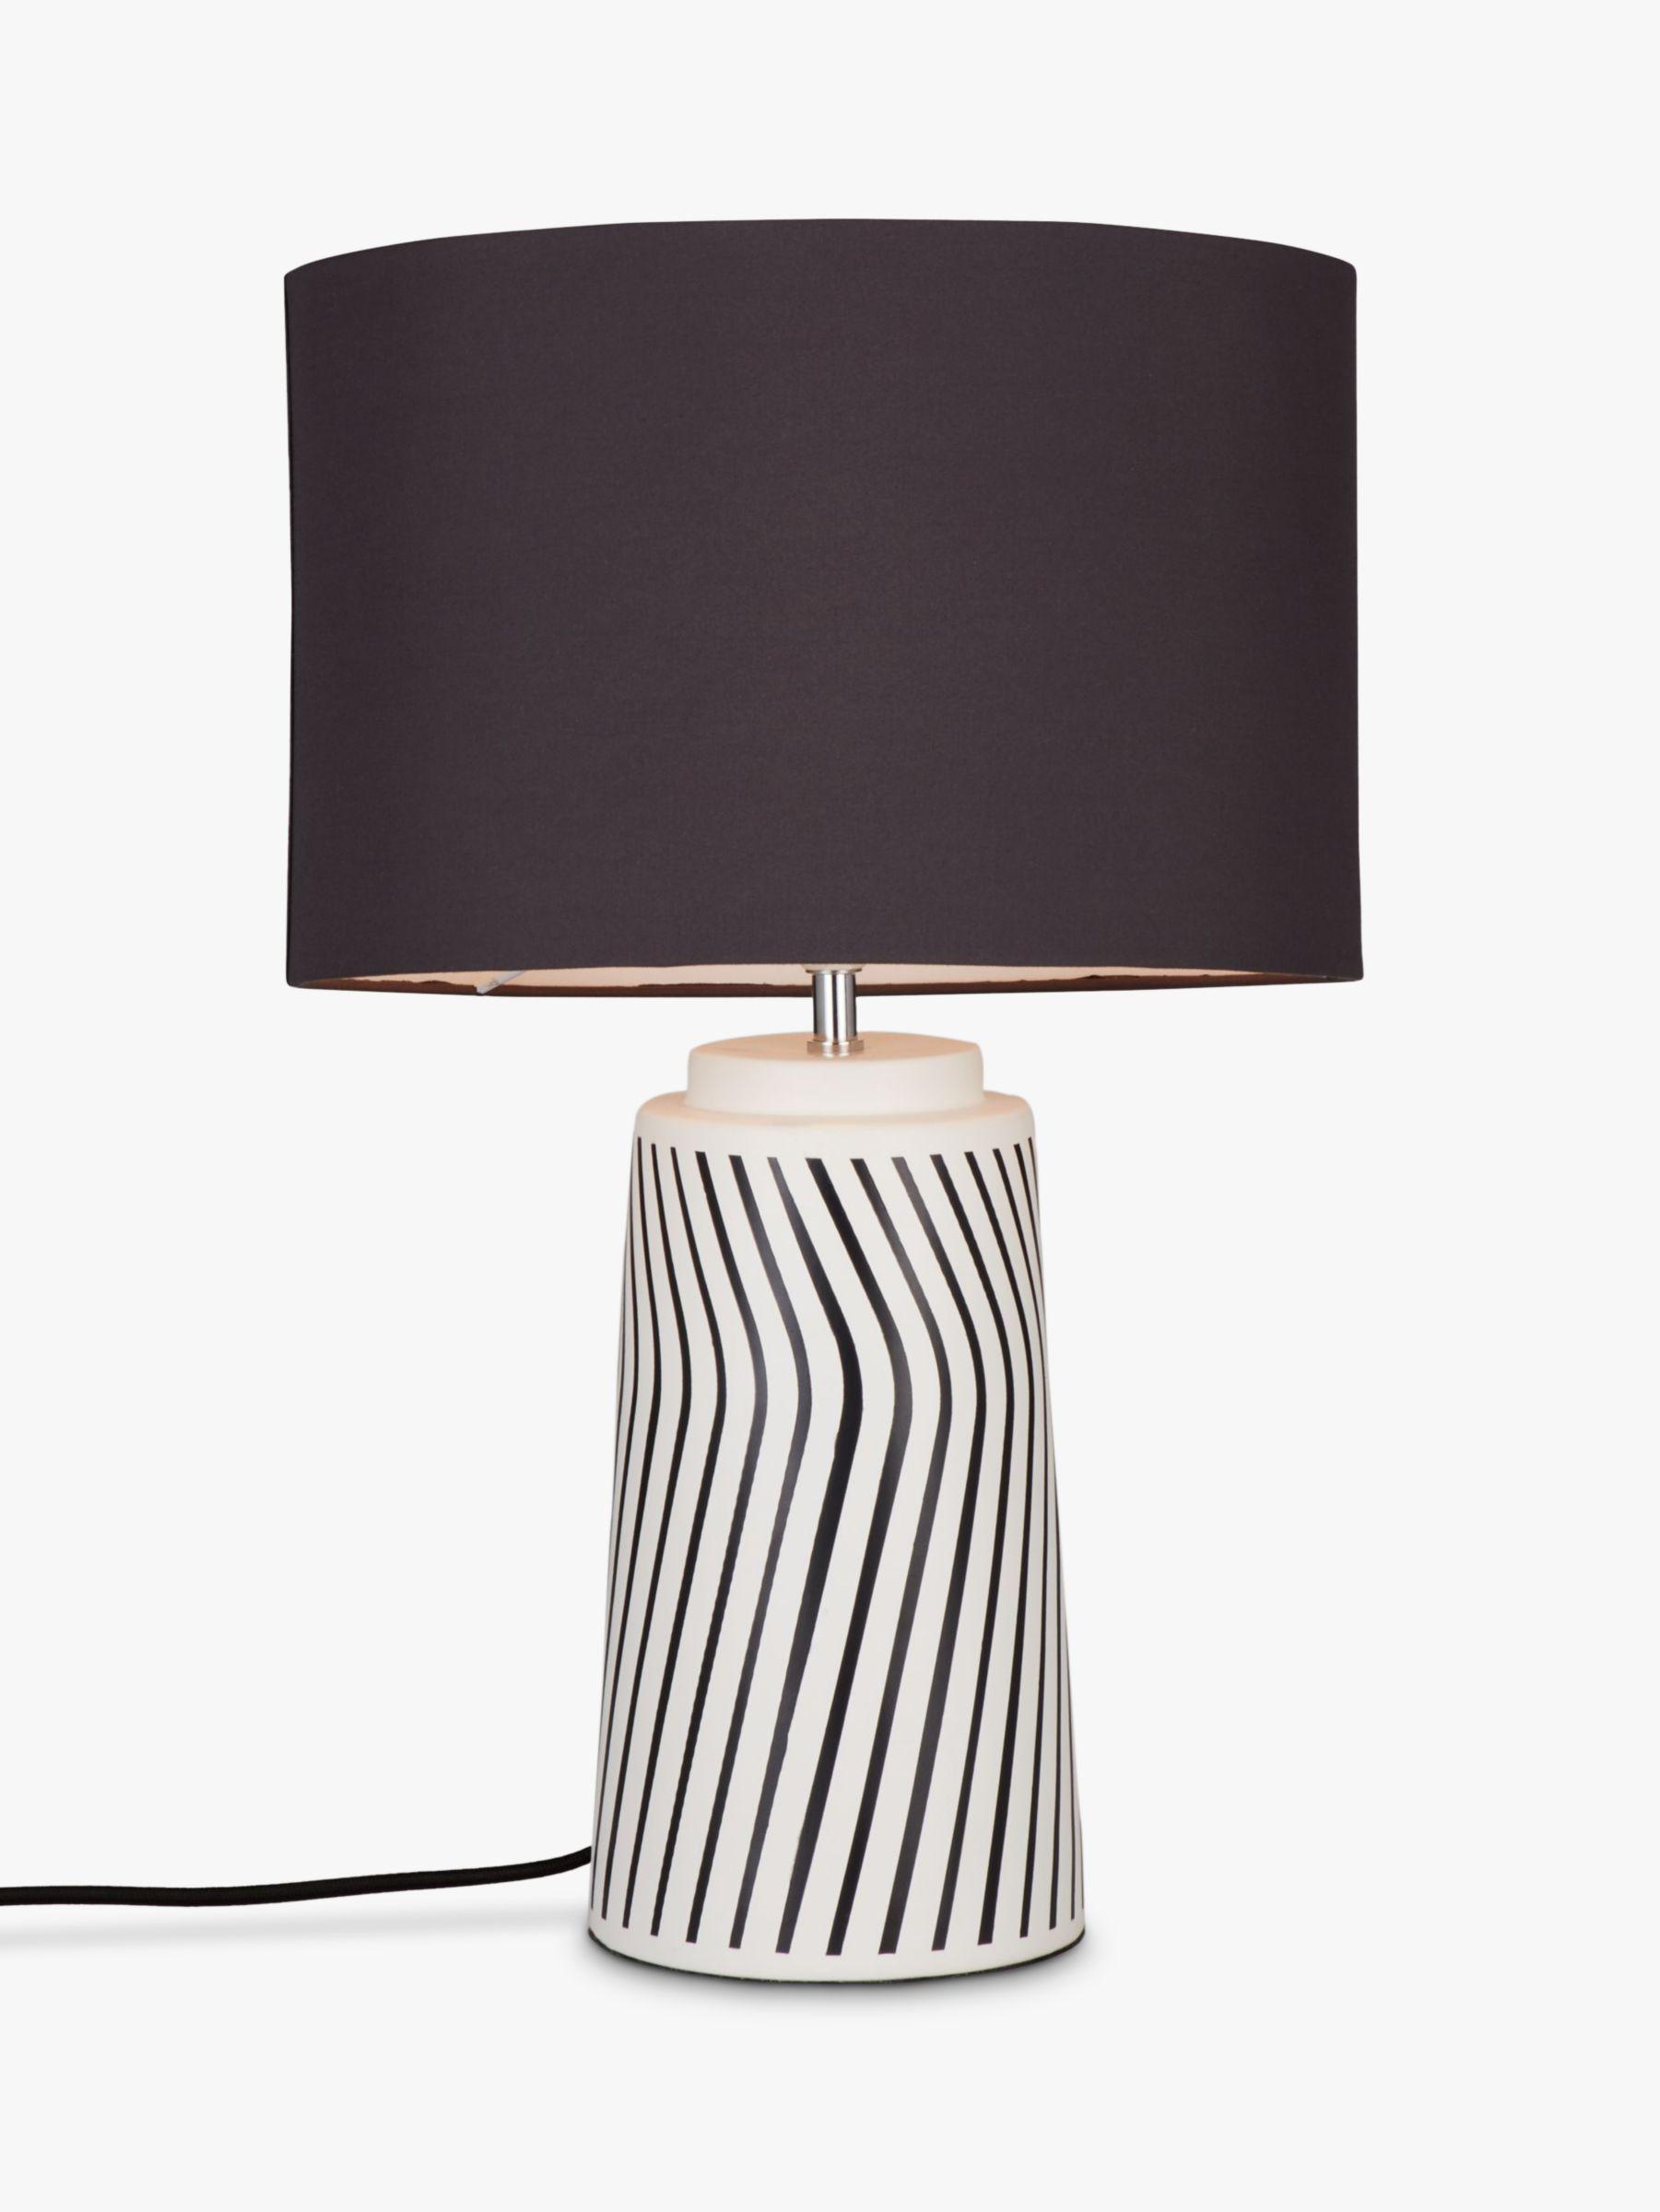 Monochrome Zig Zag Table Lamp | The